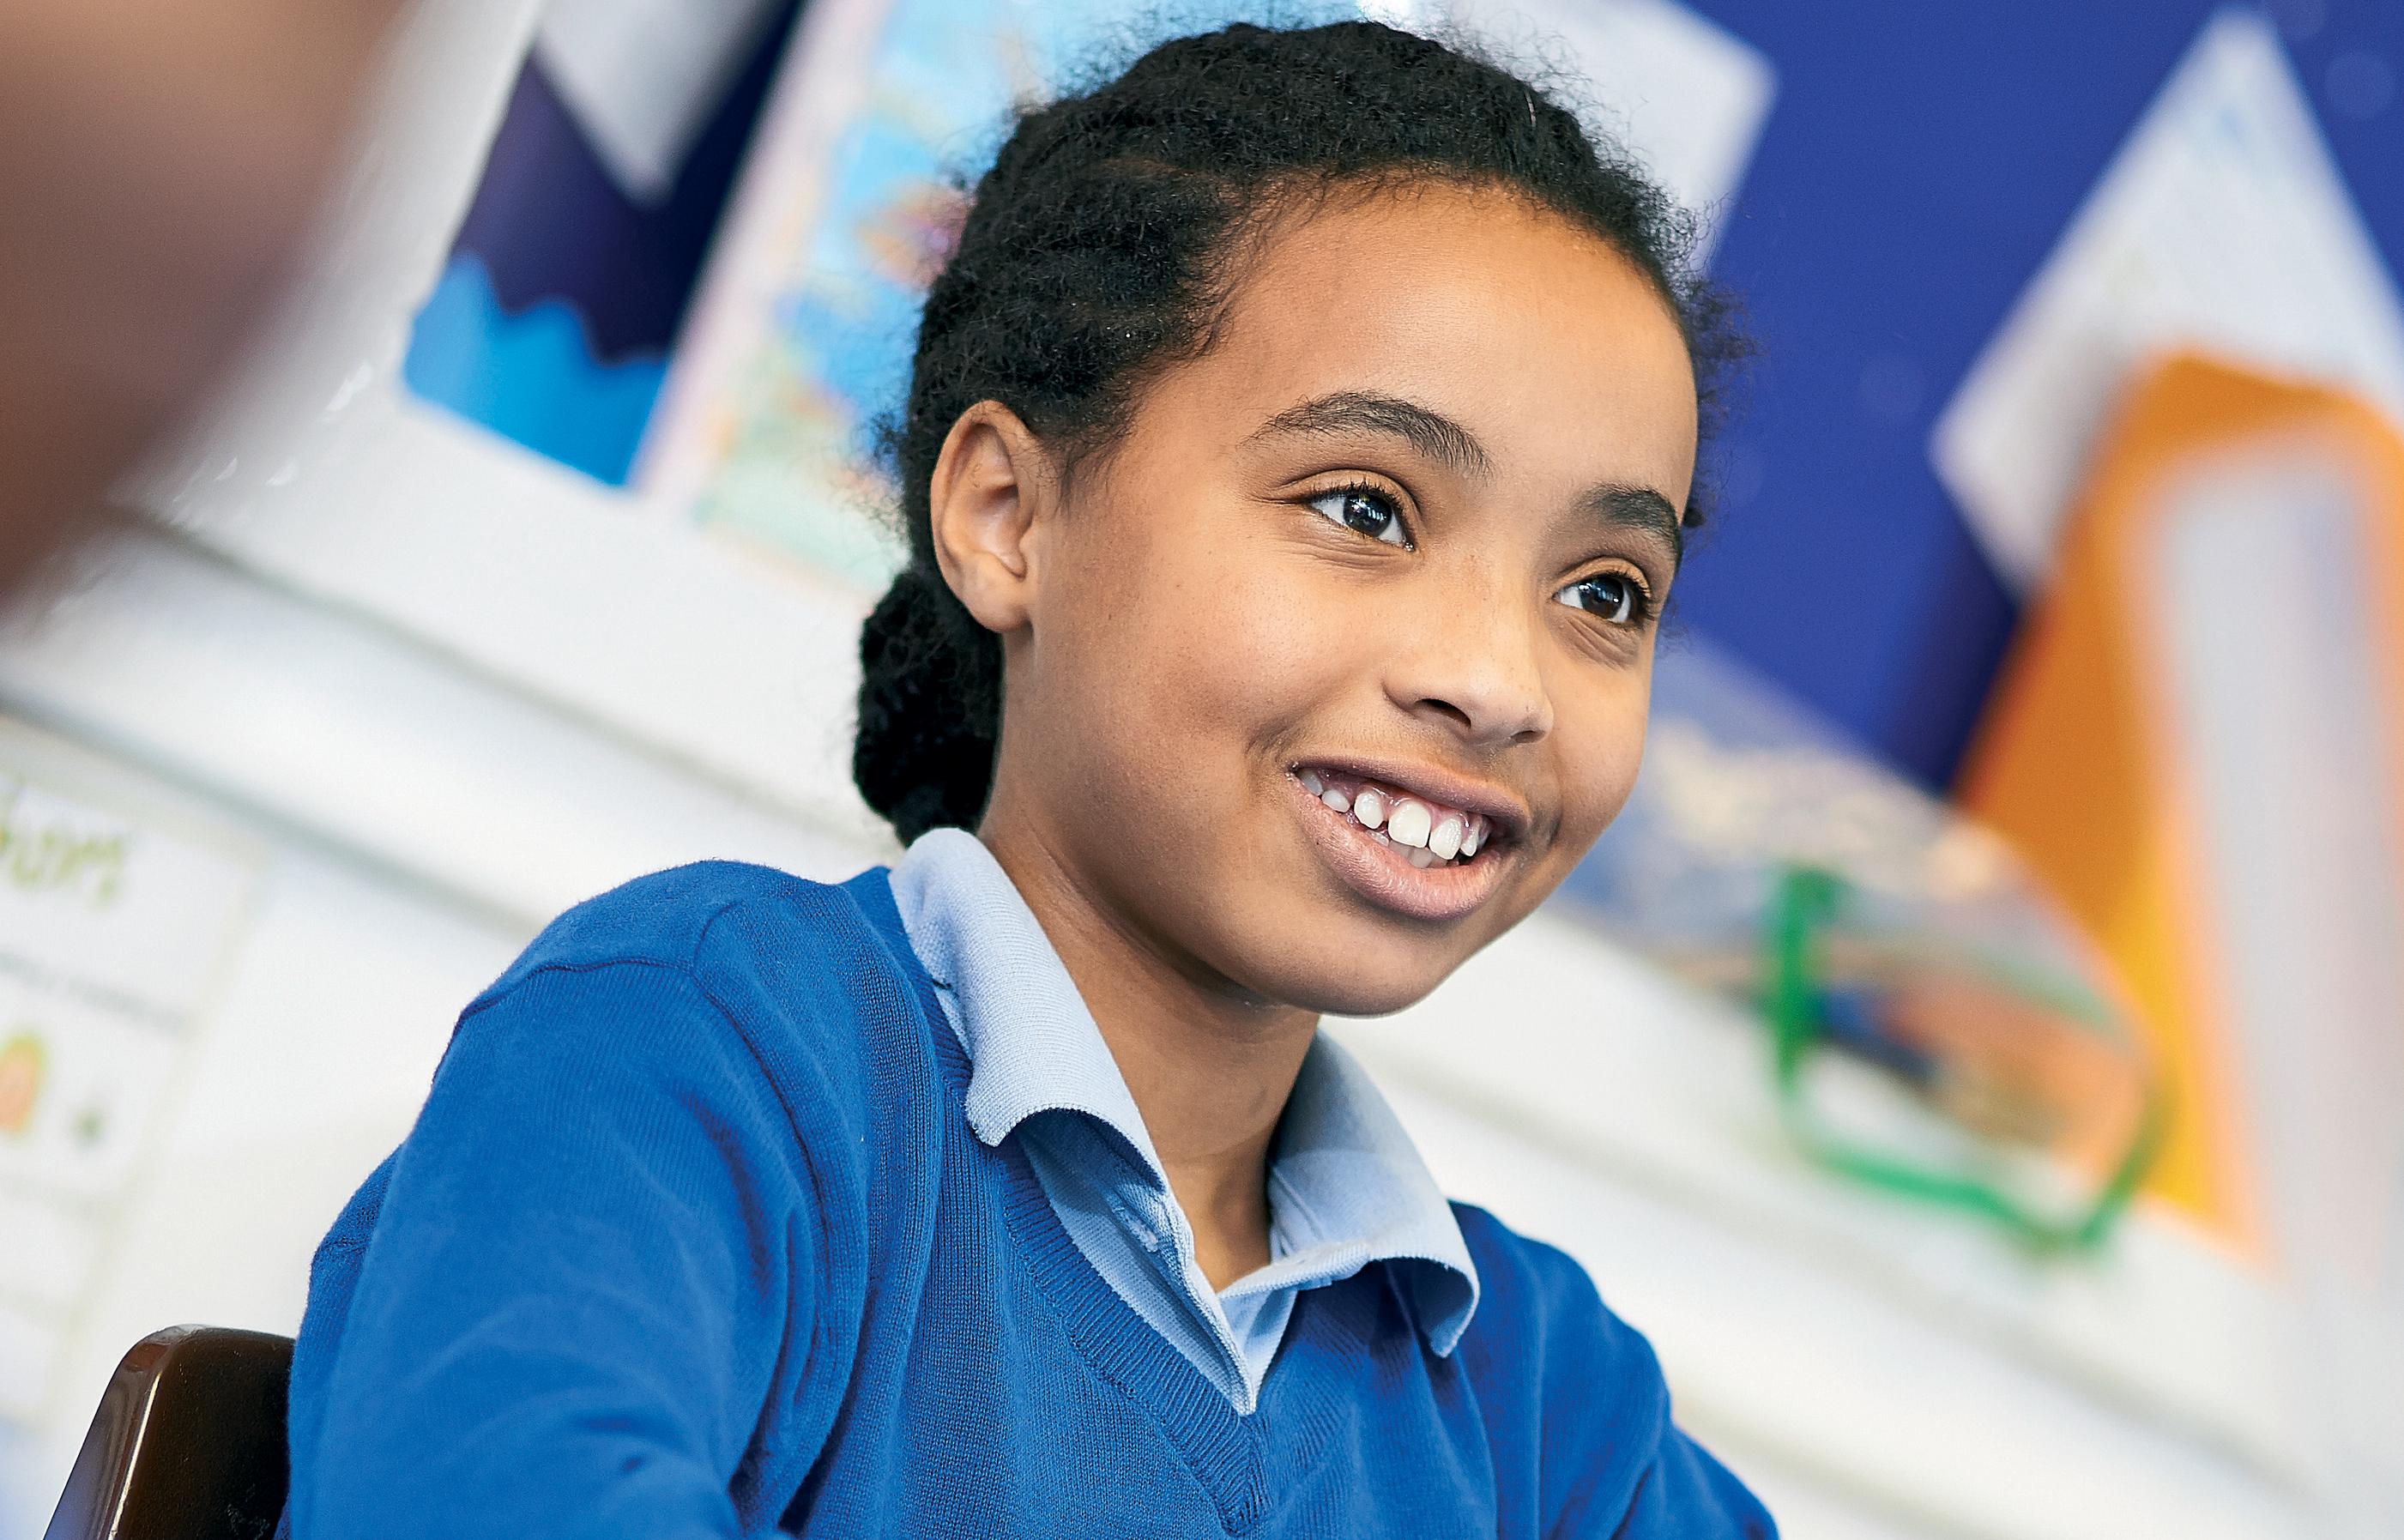 KS1 and KS2 Maths – new maths curriculum